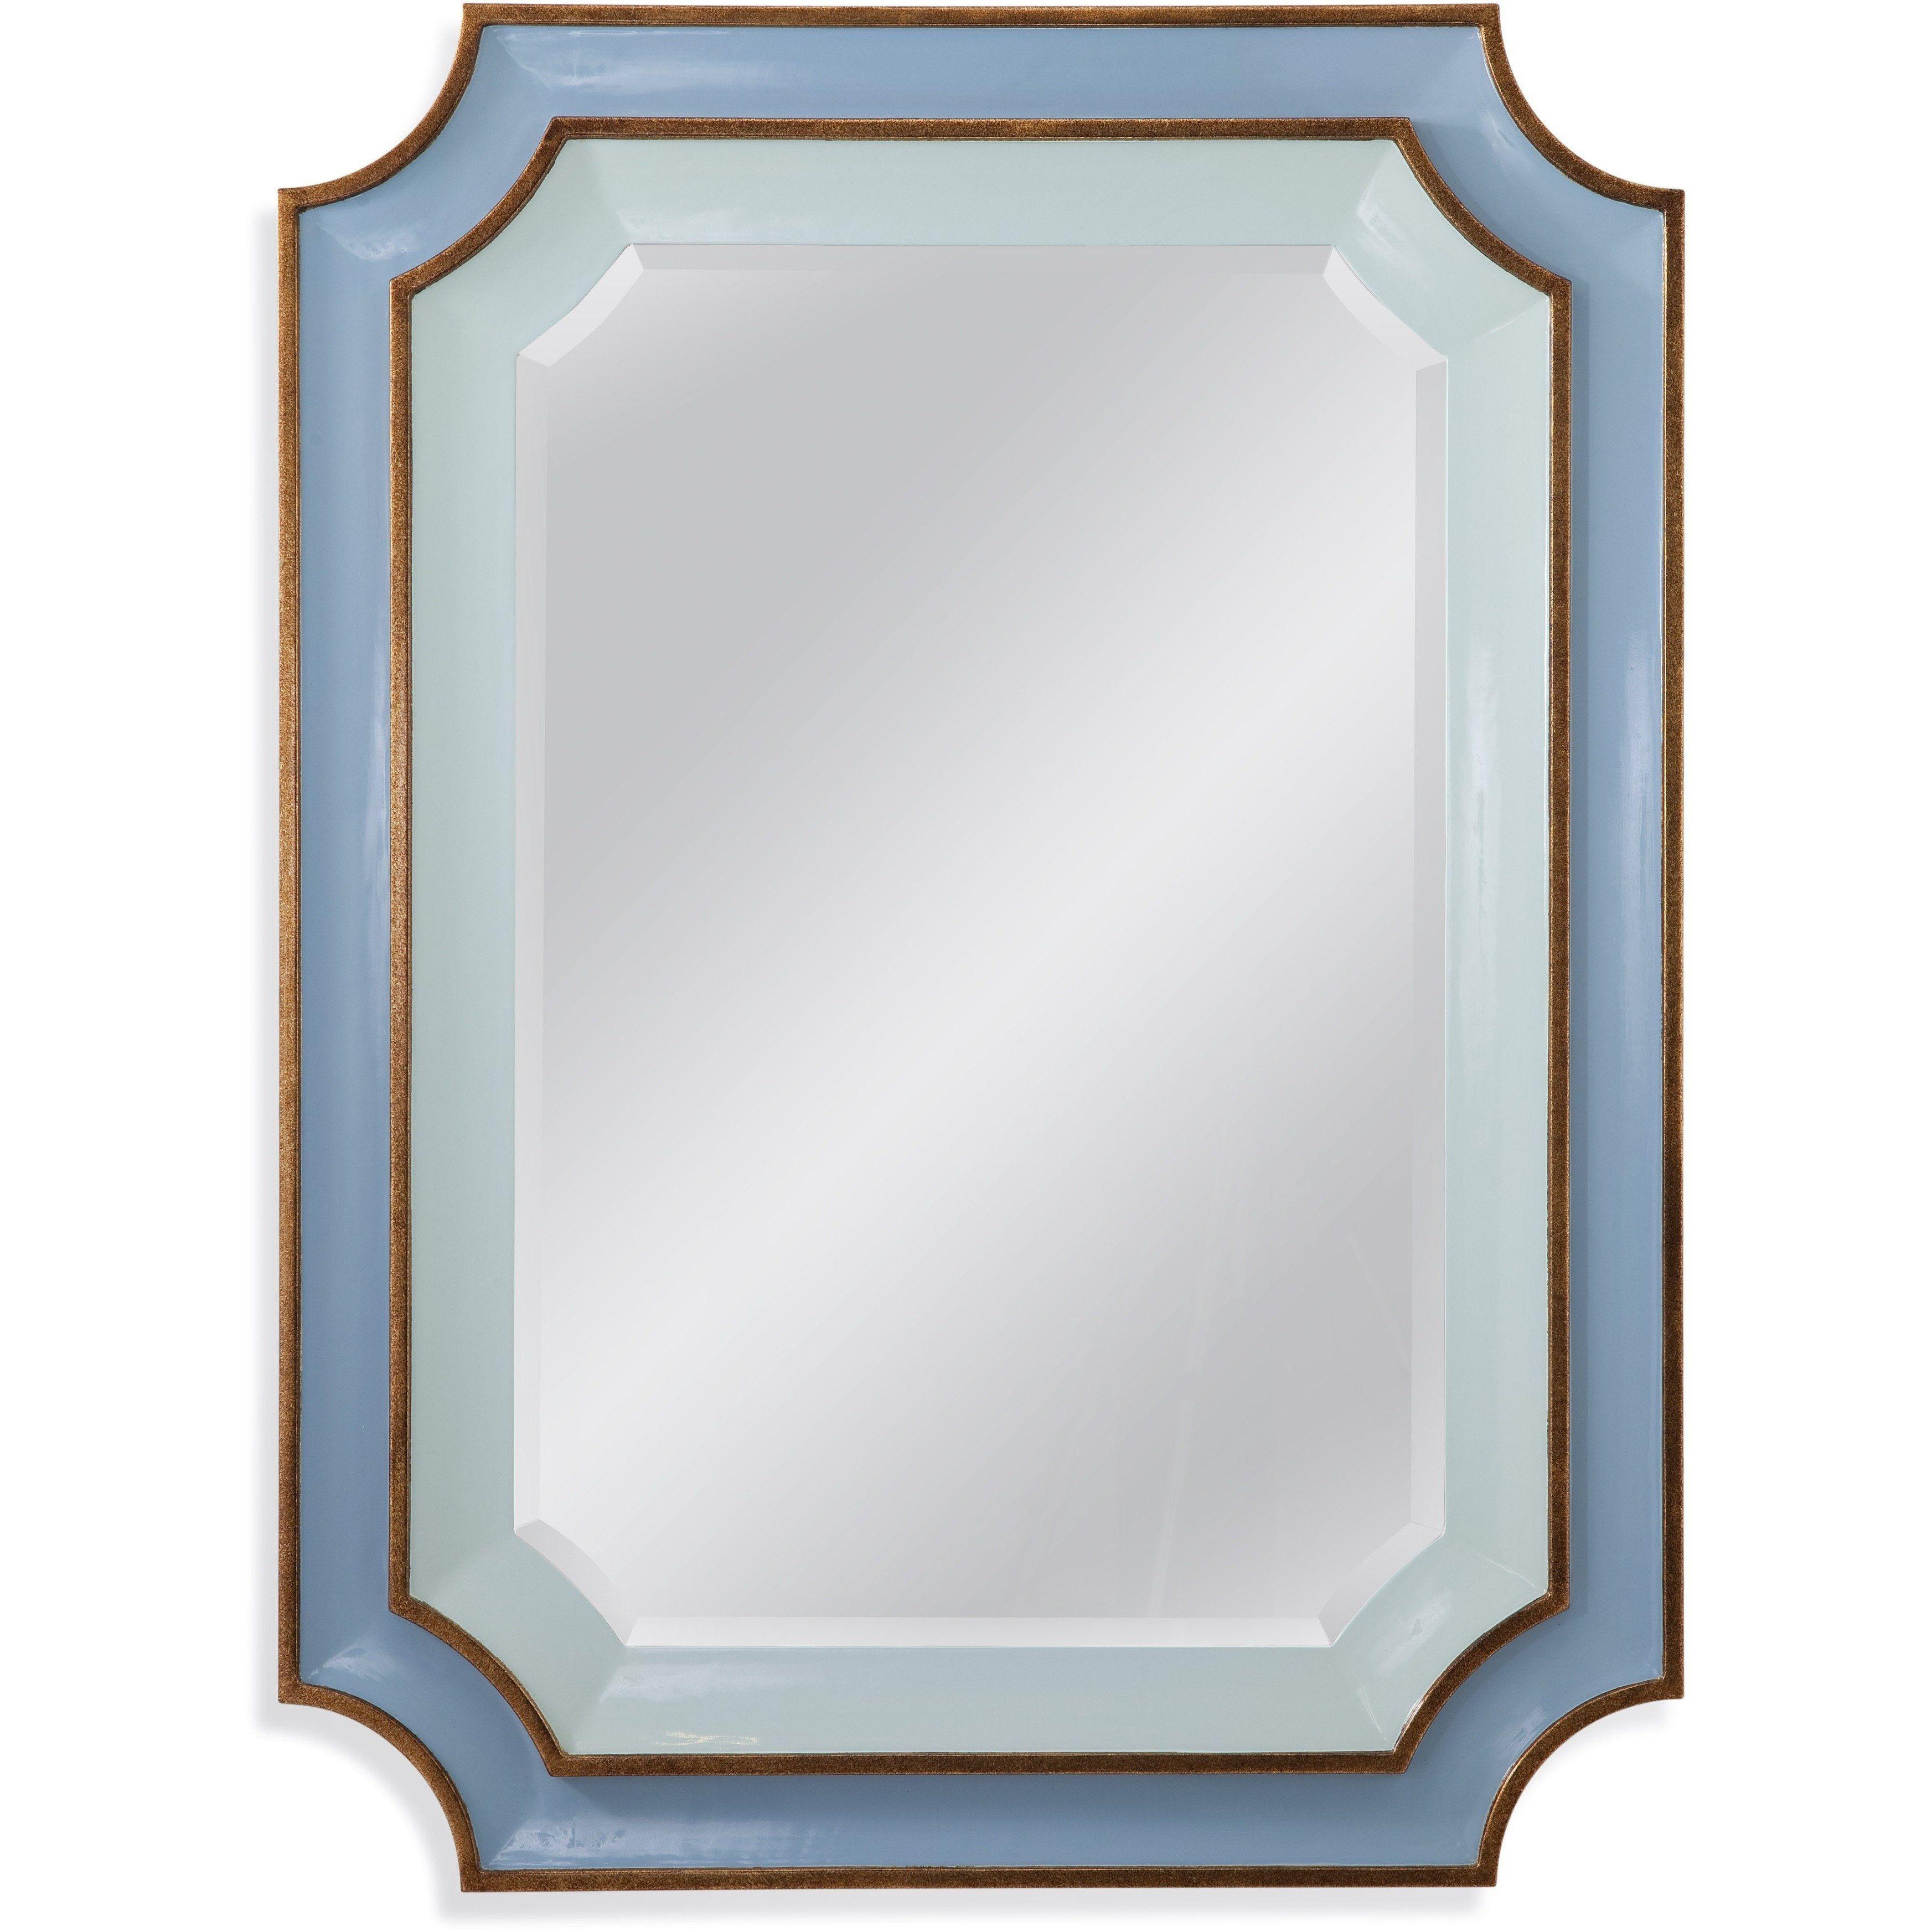 Bassett Mirror Regency Wall Mirror Blue Gold 36 X 48 M3807bec